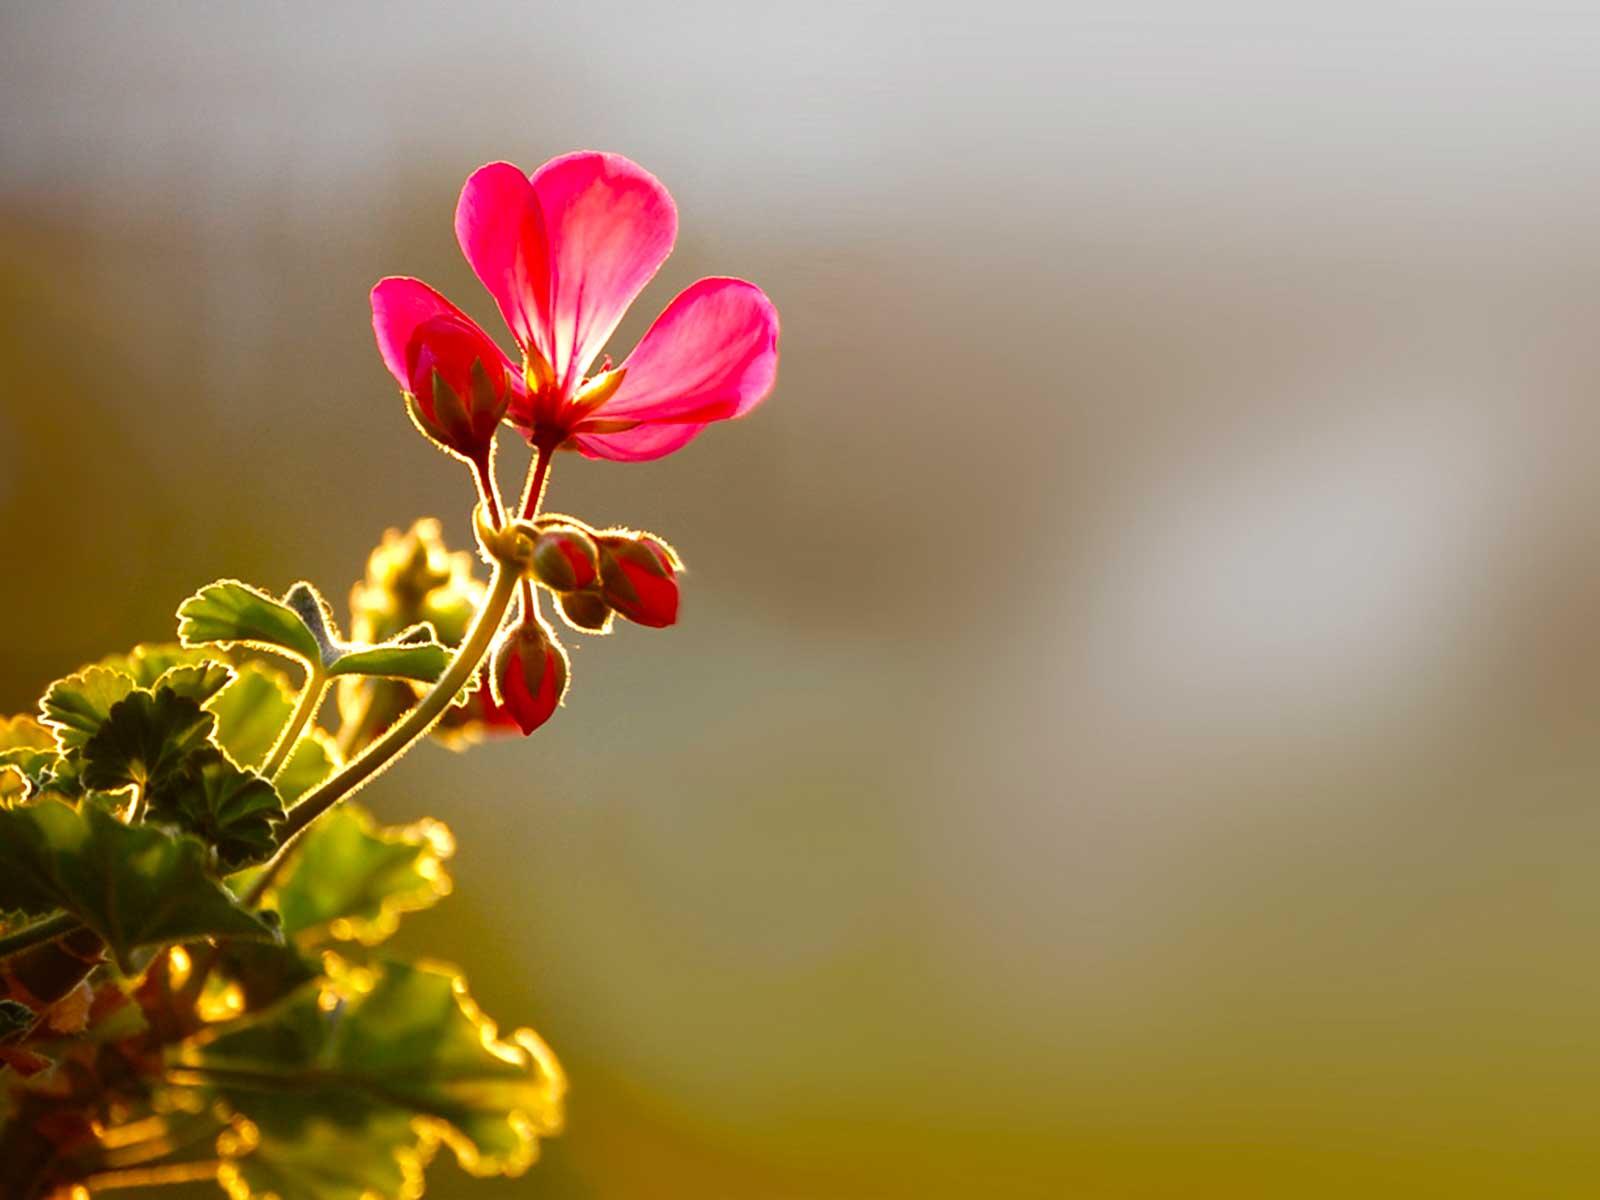 Flower HDR Background.